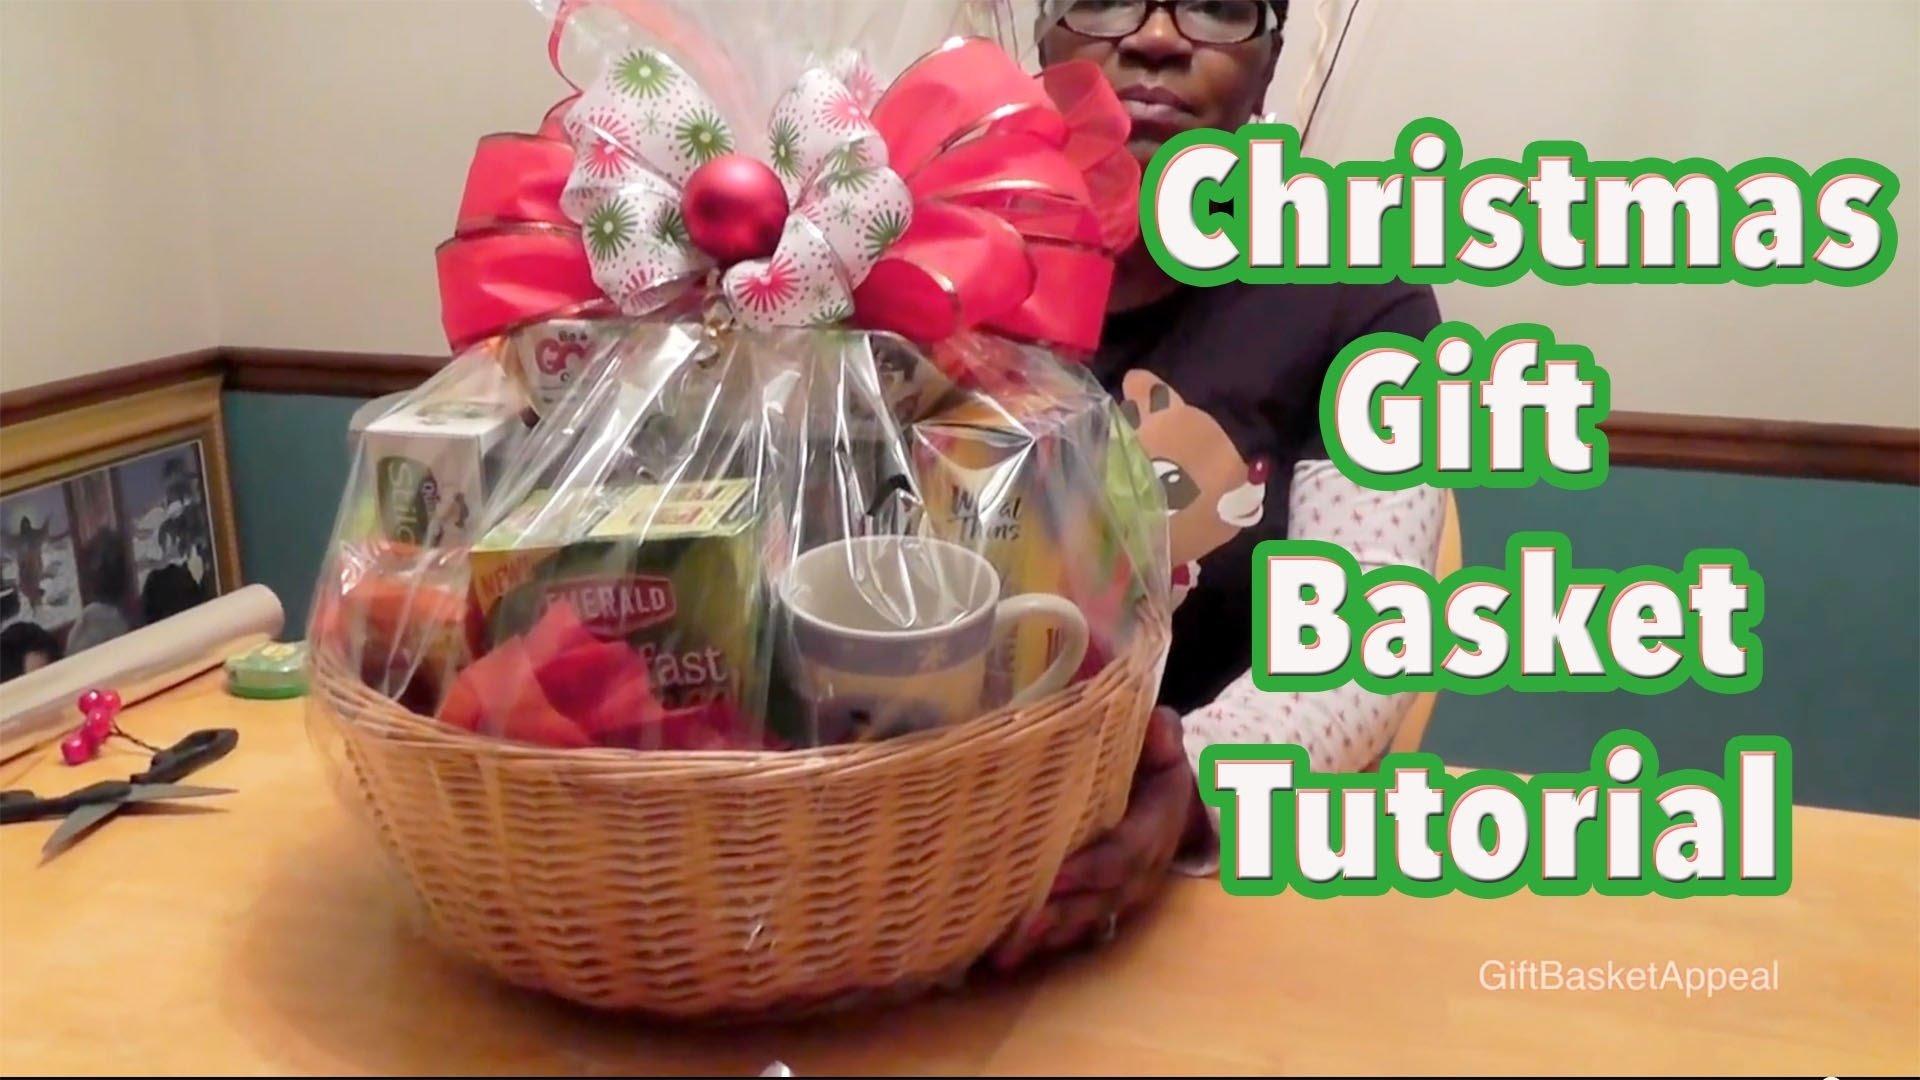 10 Fabulous Diy Christmas Gift Basket Ideas diy gift basket tutorial christmas gift basket giftbasketappeal 4 2020